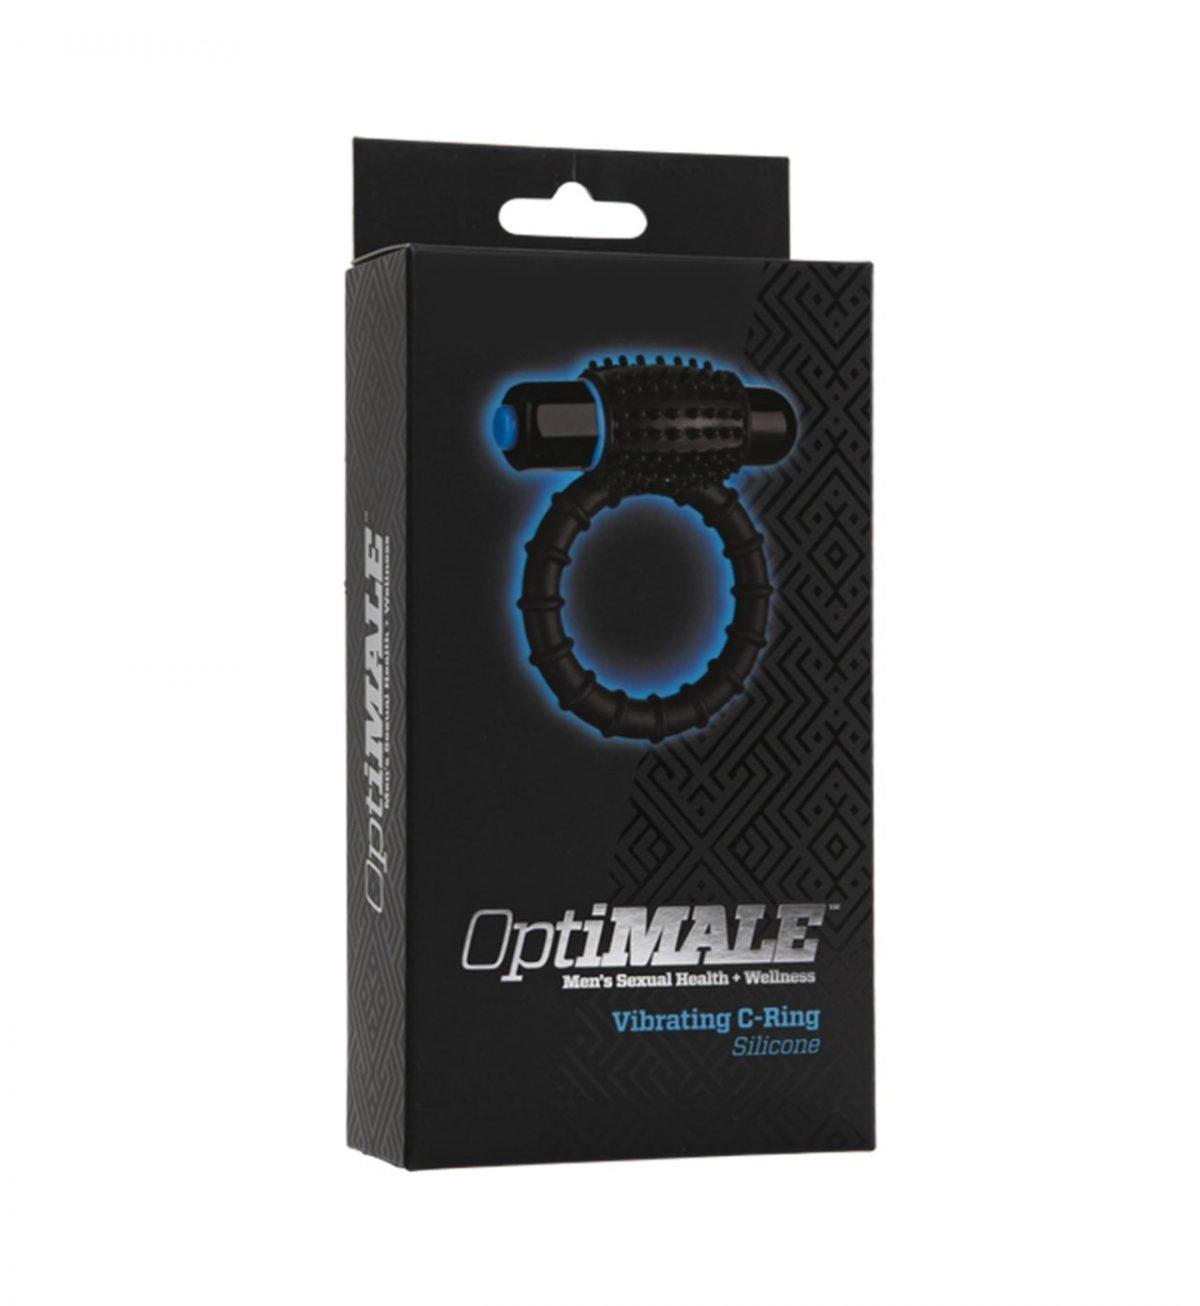 Vibrerande C-Ring, Svart - Rillet vibrerende penisring - OptiMale